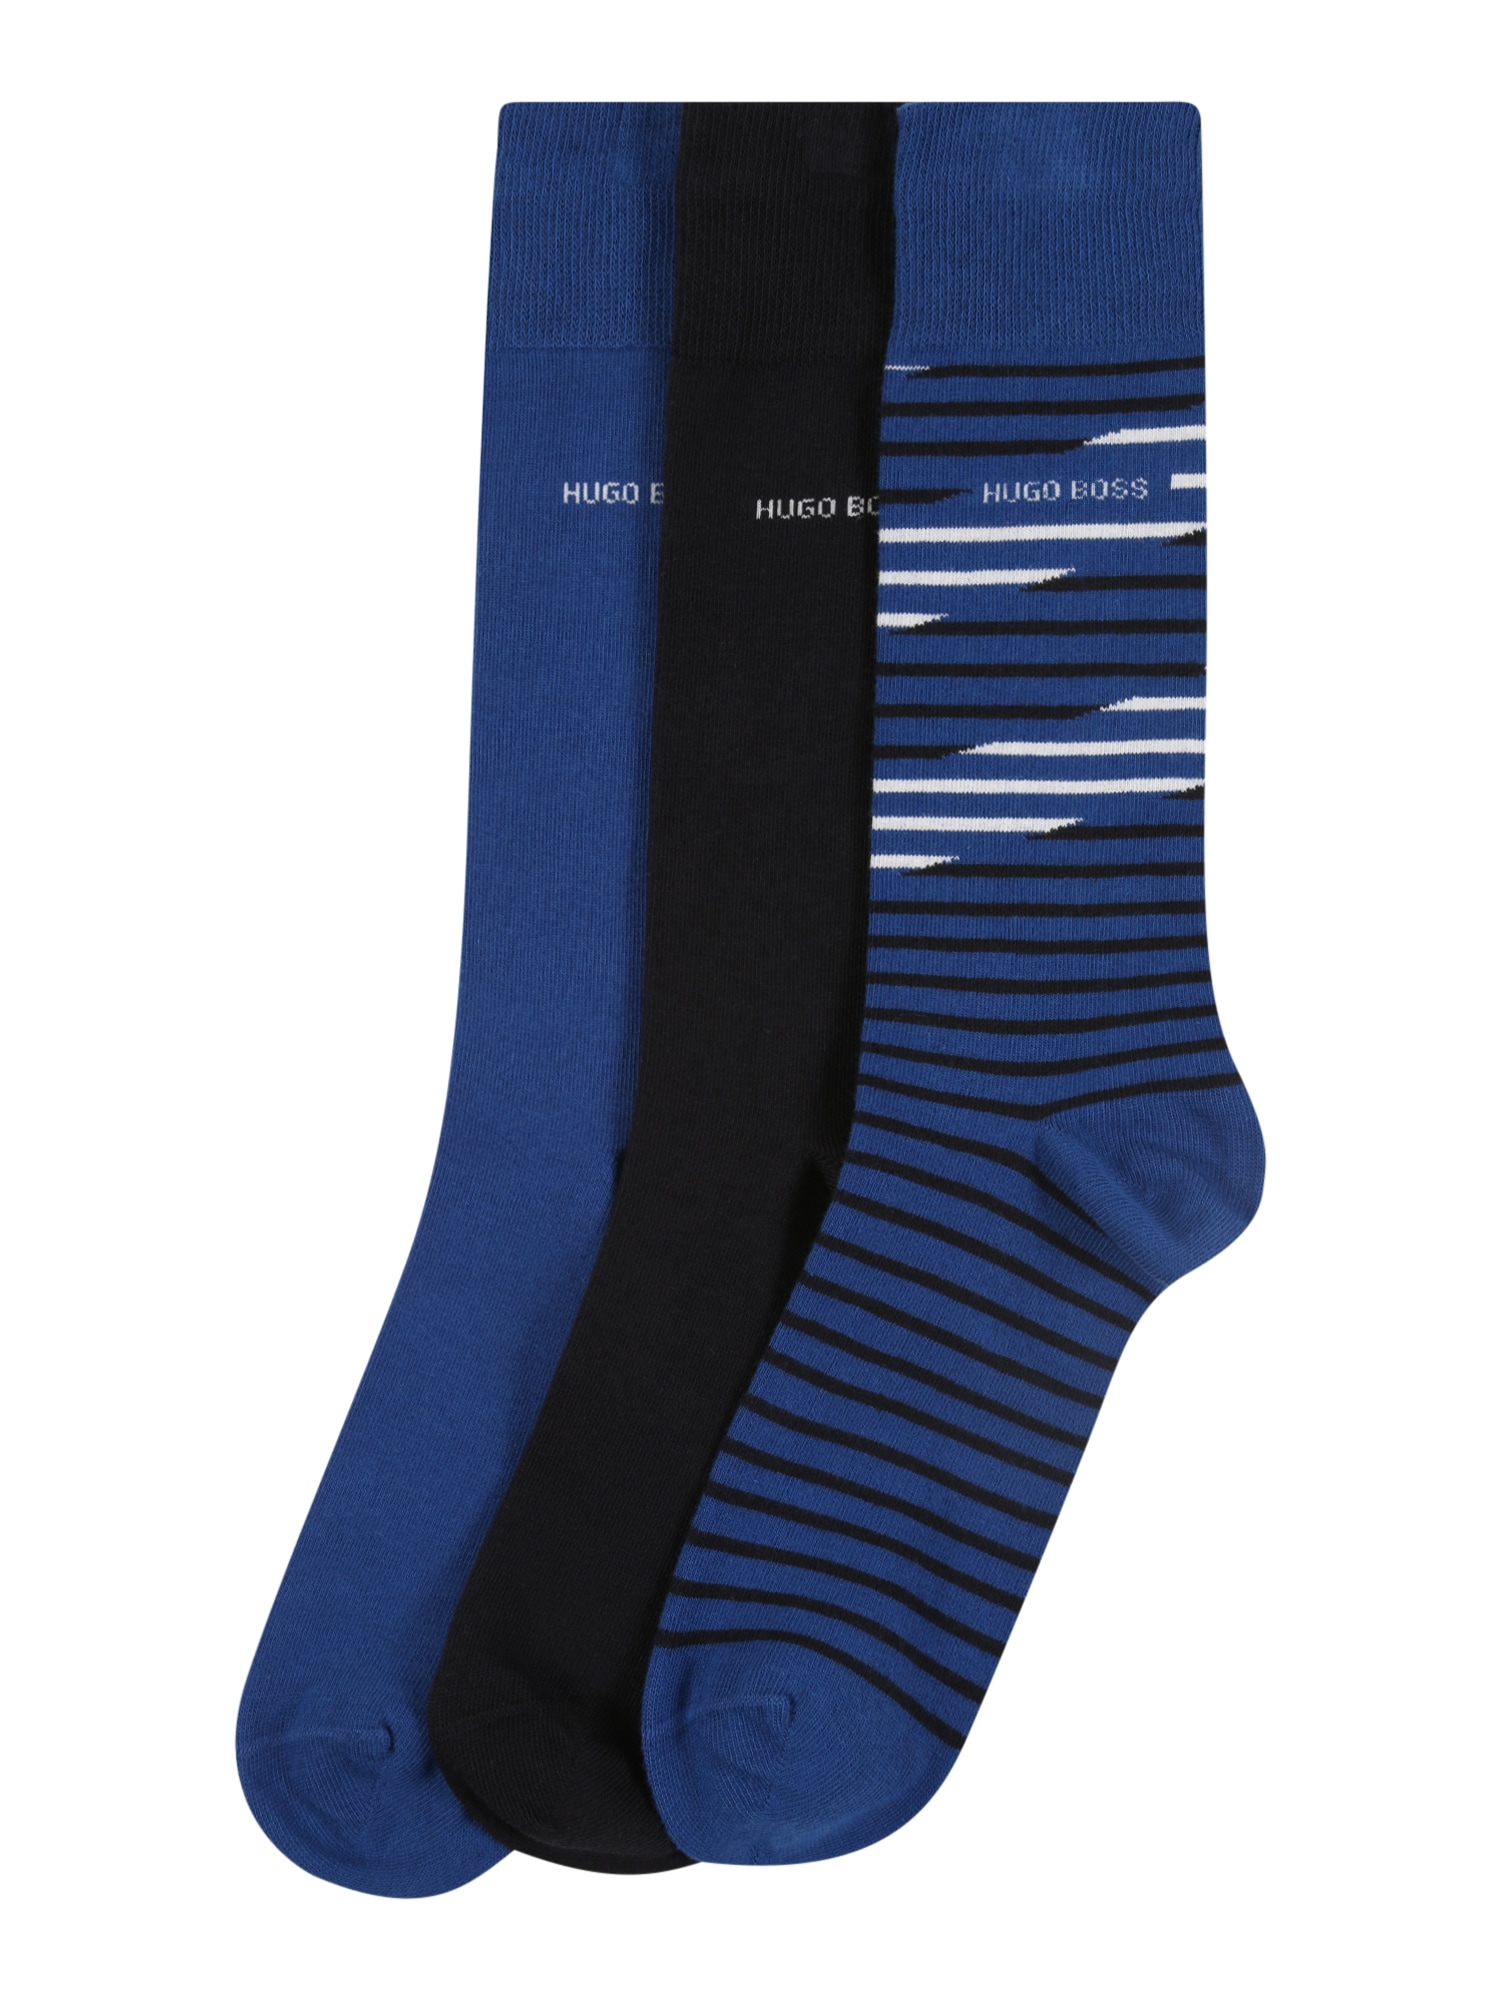 BOSS Kojinės 'RS Gift Set CC' balta / mėlyna / tamsiai mėlyna jūros spalva